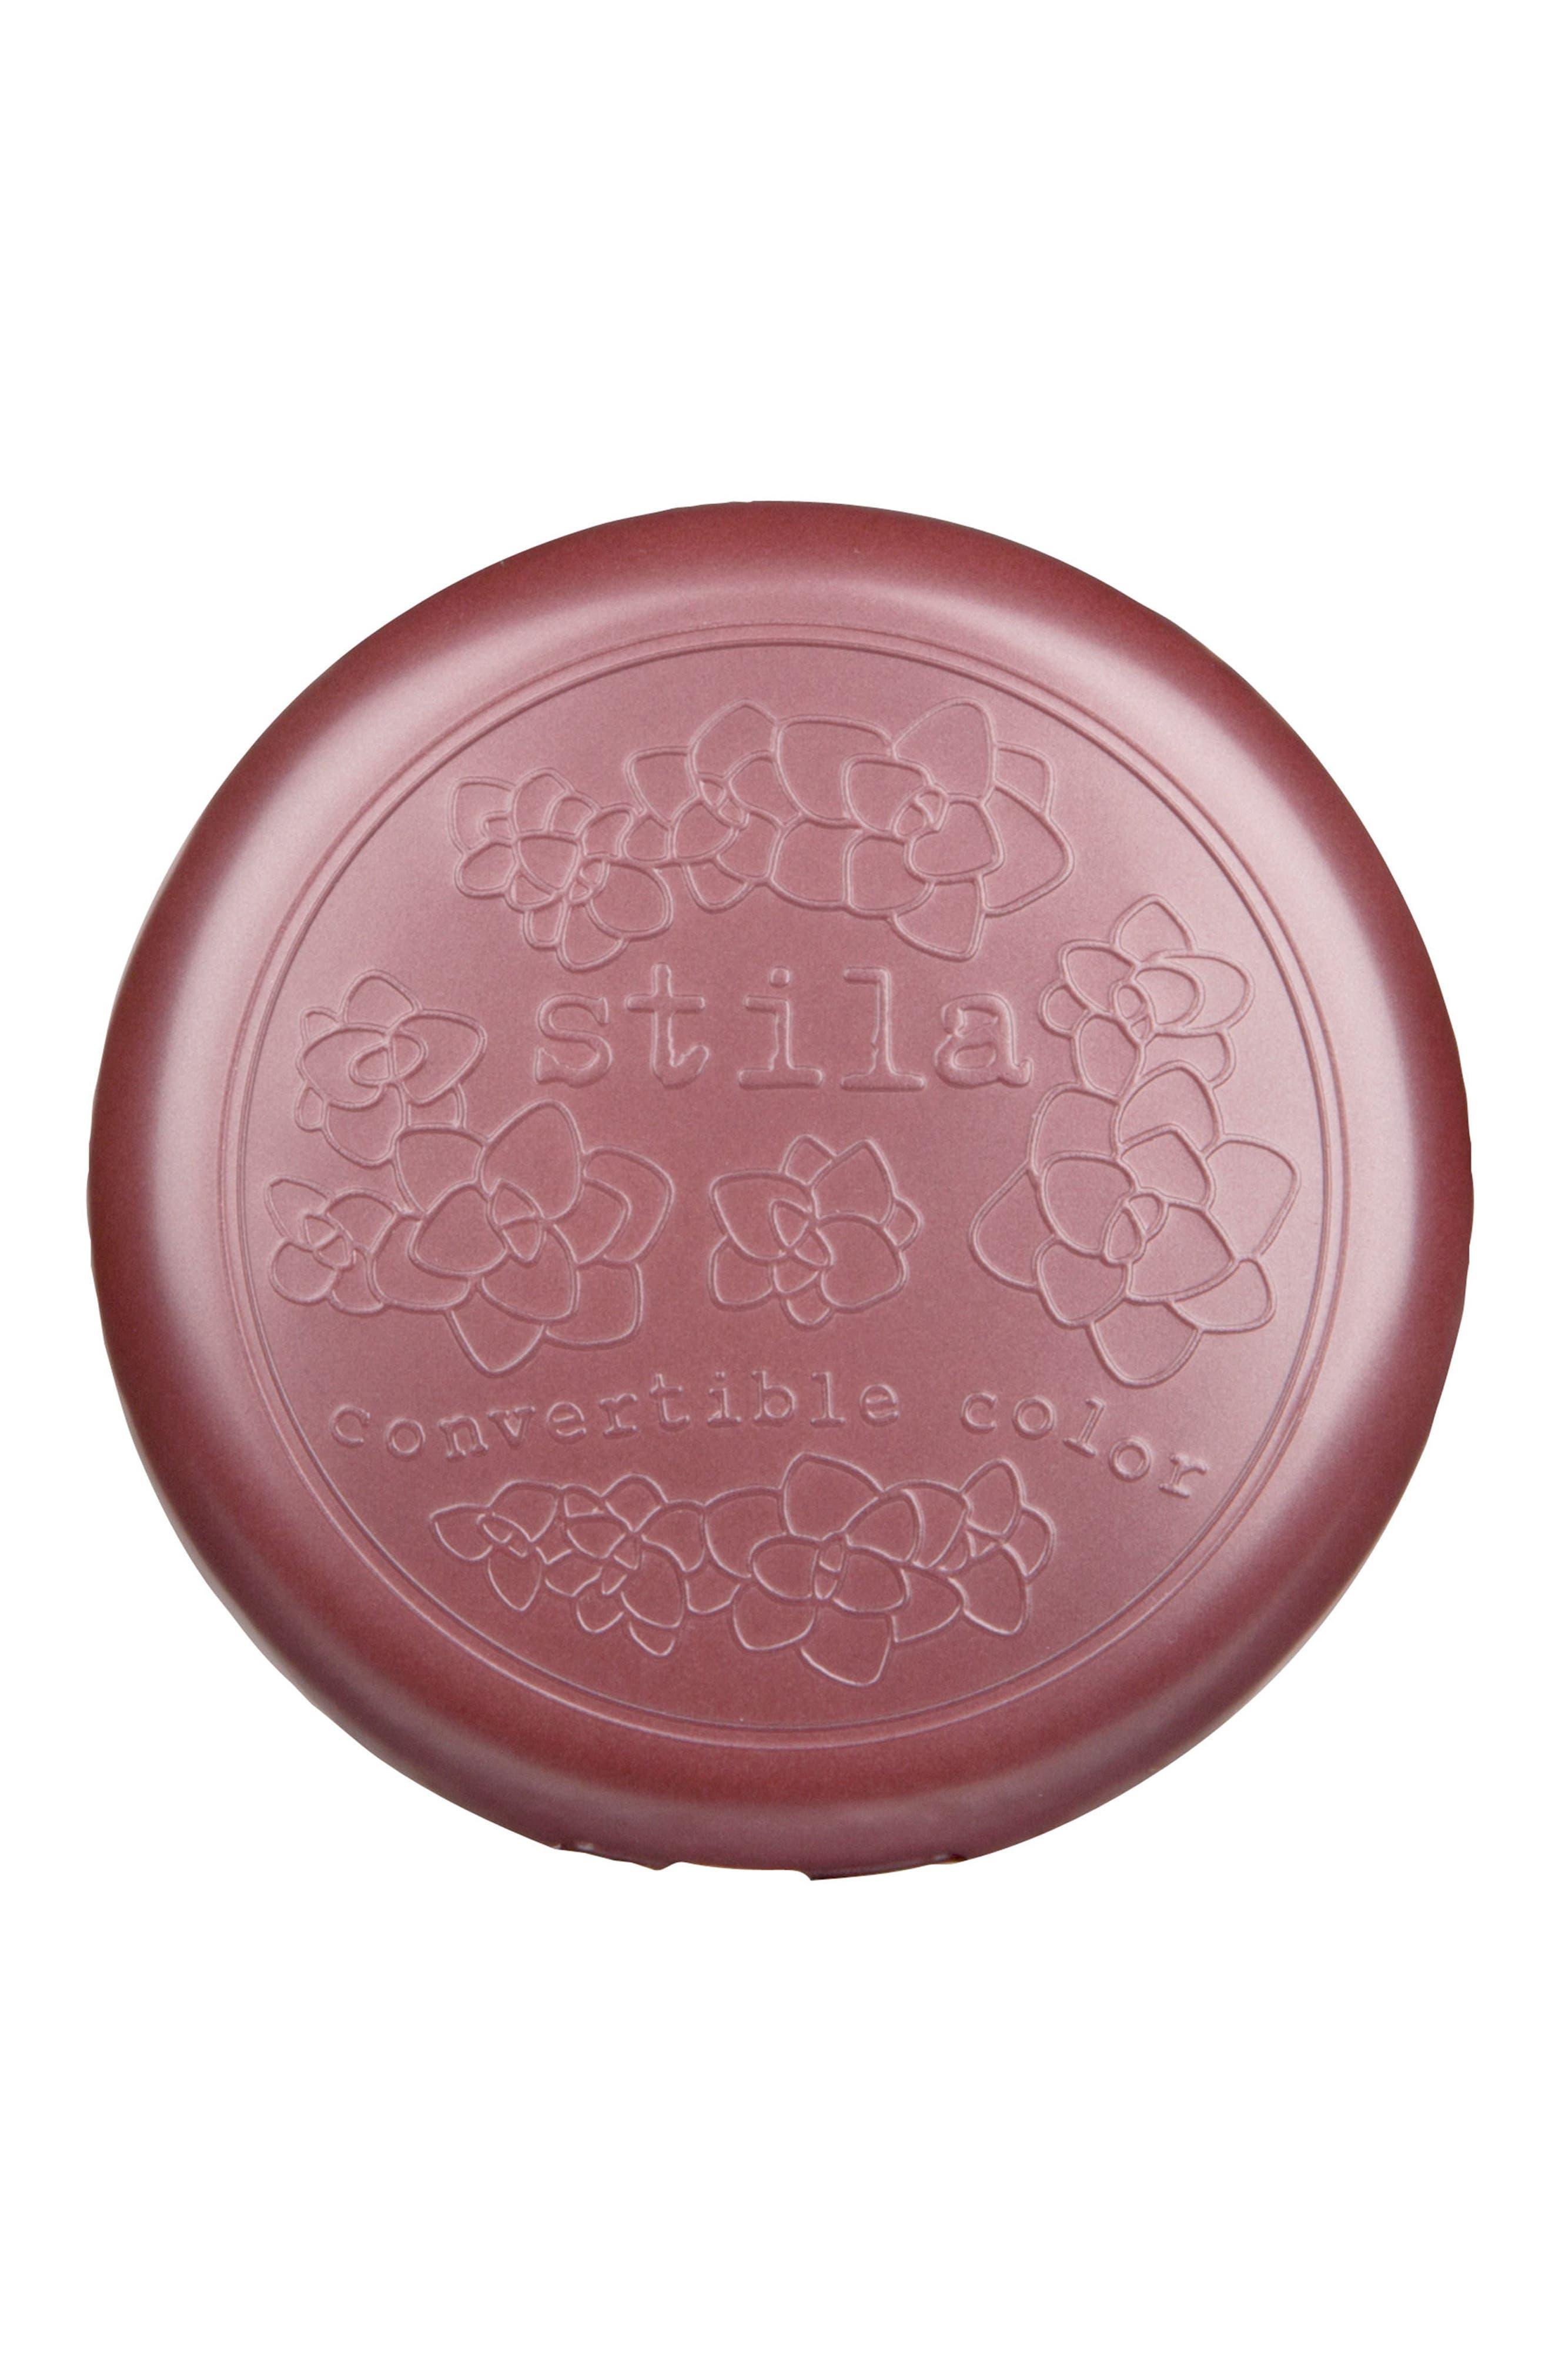 Alternate Image 1 Selected - Stila Convertible Color Dual Lip & Cheek Cream